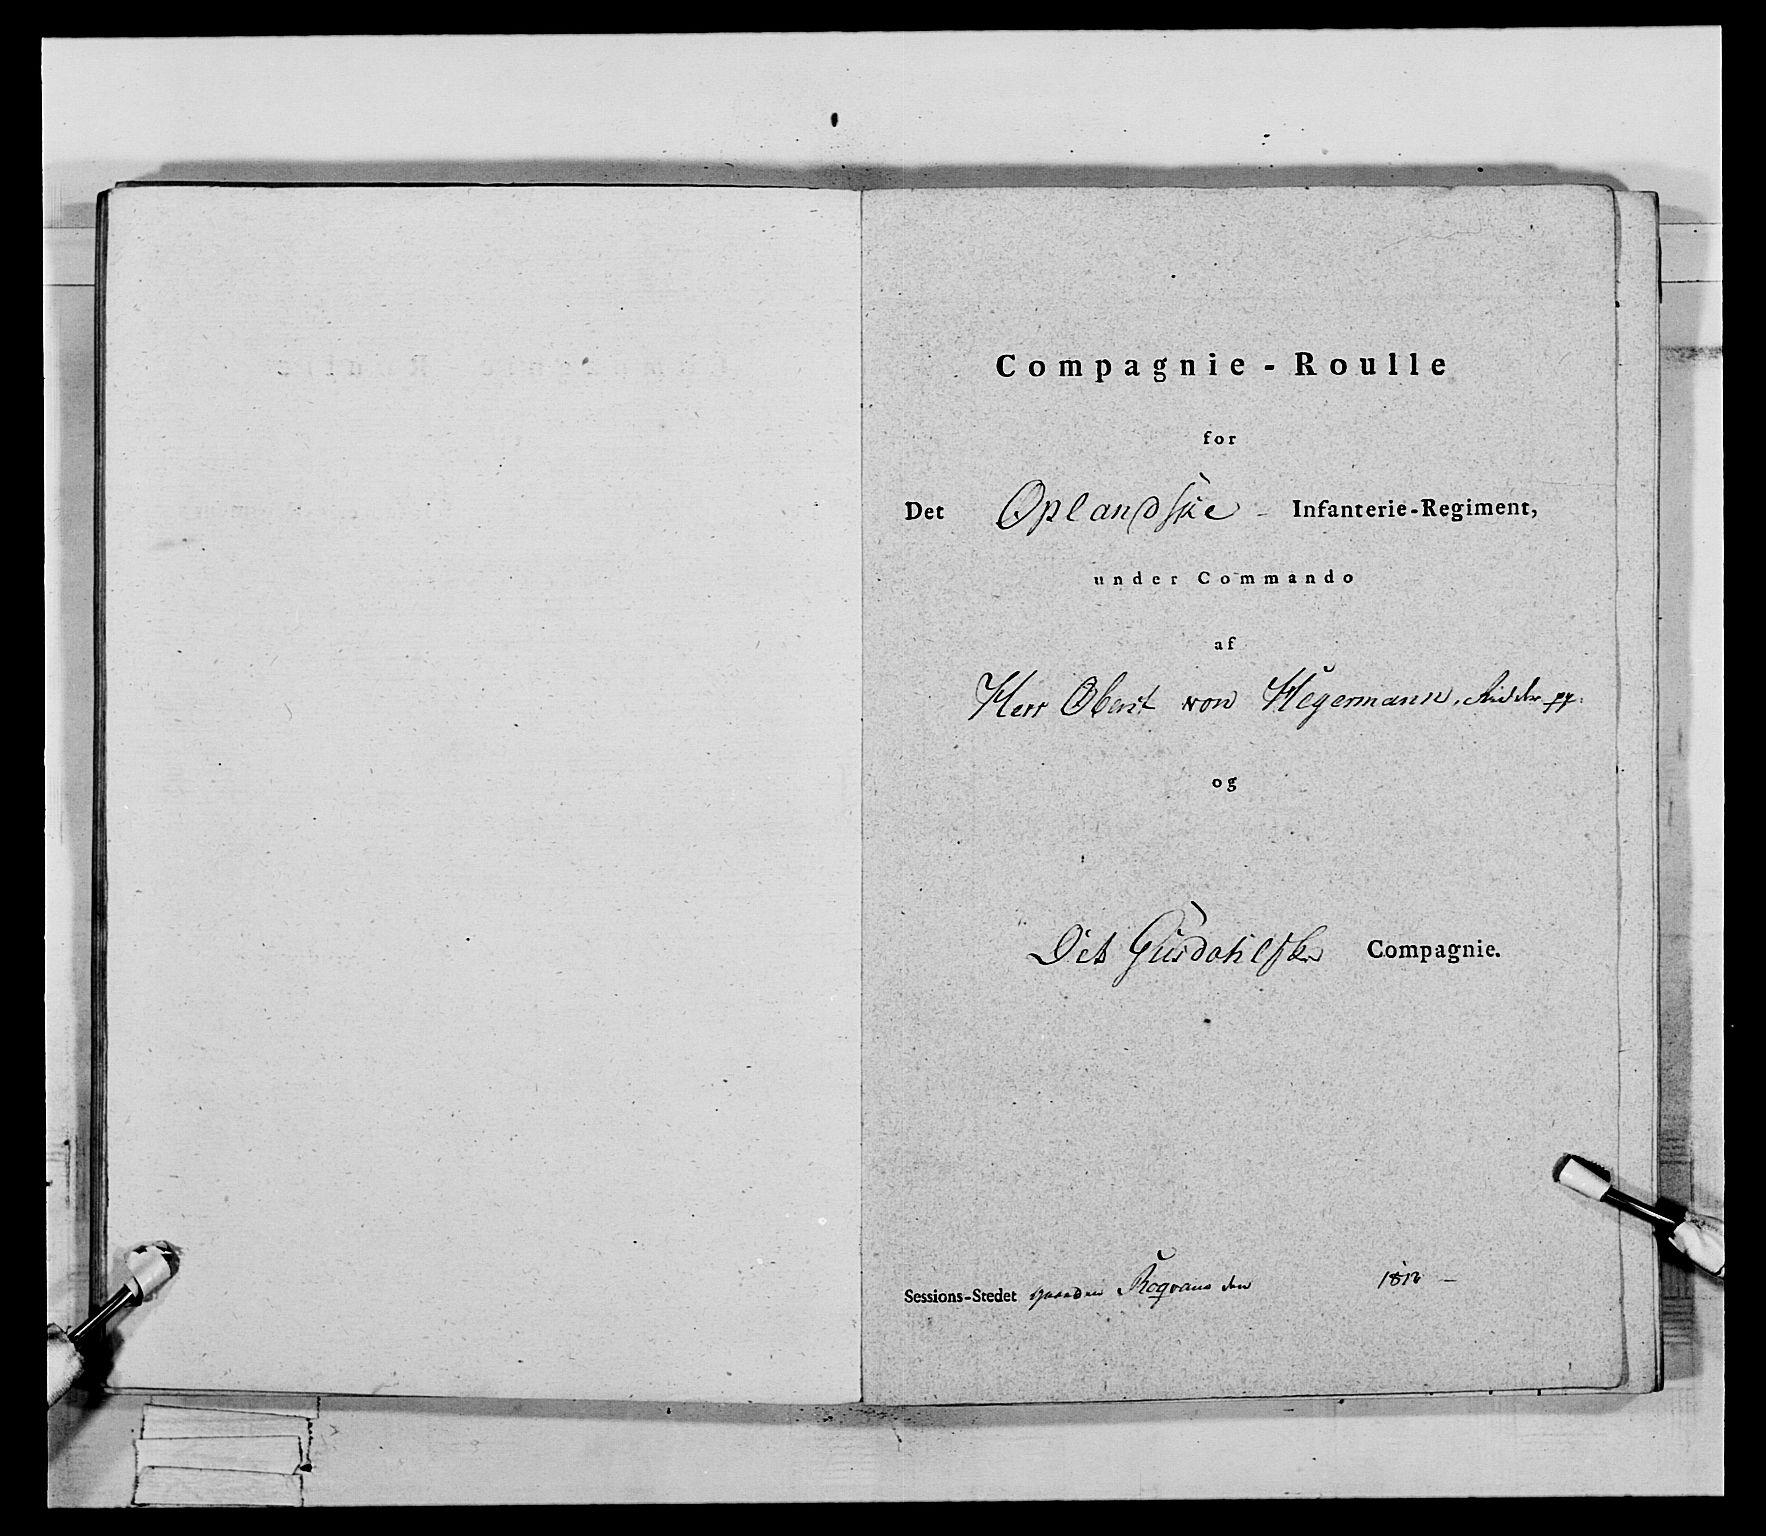 RA, Generalitets- og kommissariatskollegiet, Det kongelige norske kommissariatskollegium, E/Eh/L0069: Opplandske gevorbne infanteriregiment, 1810-1818, s. 515